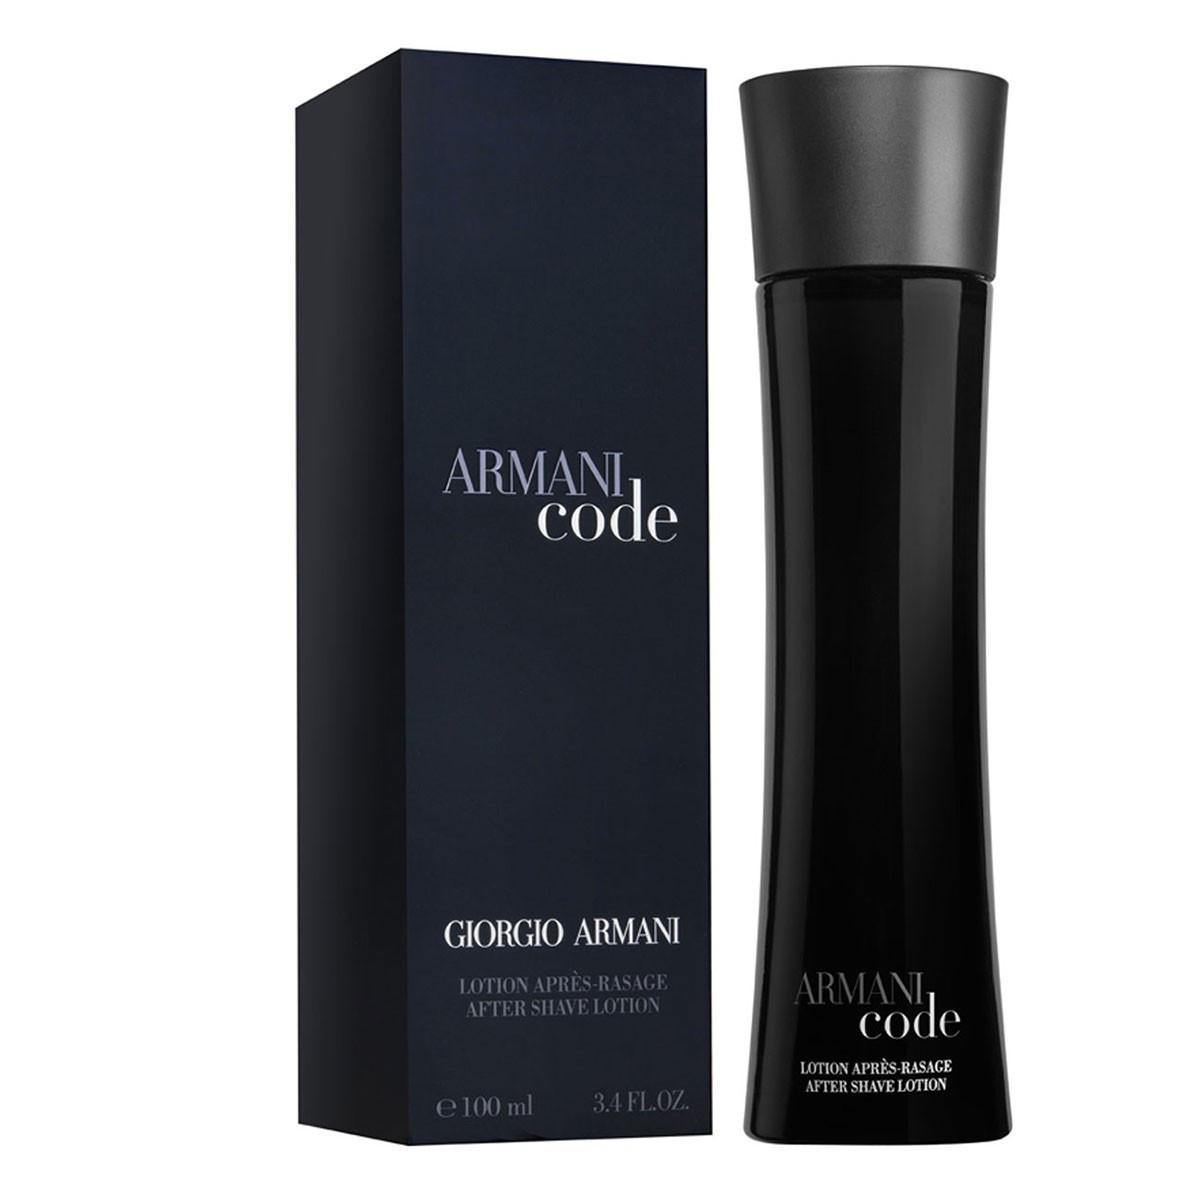 Giorgio Armani Code Pour Homme Туалетная вода 100 ml ( Джорджио Армани Код Пур Хом )